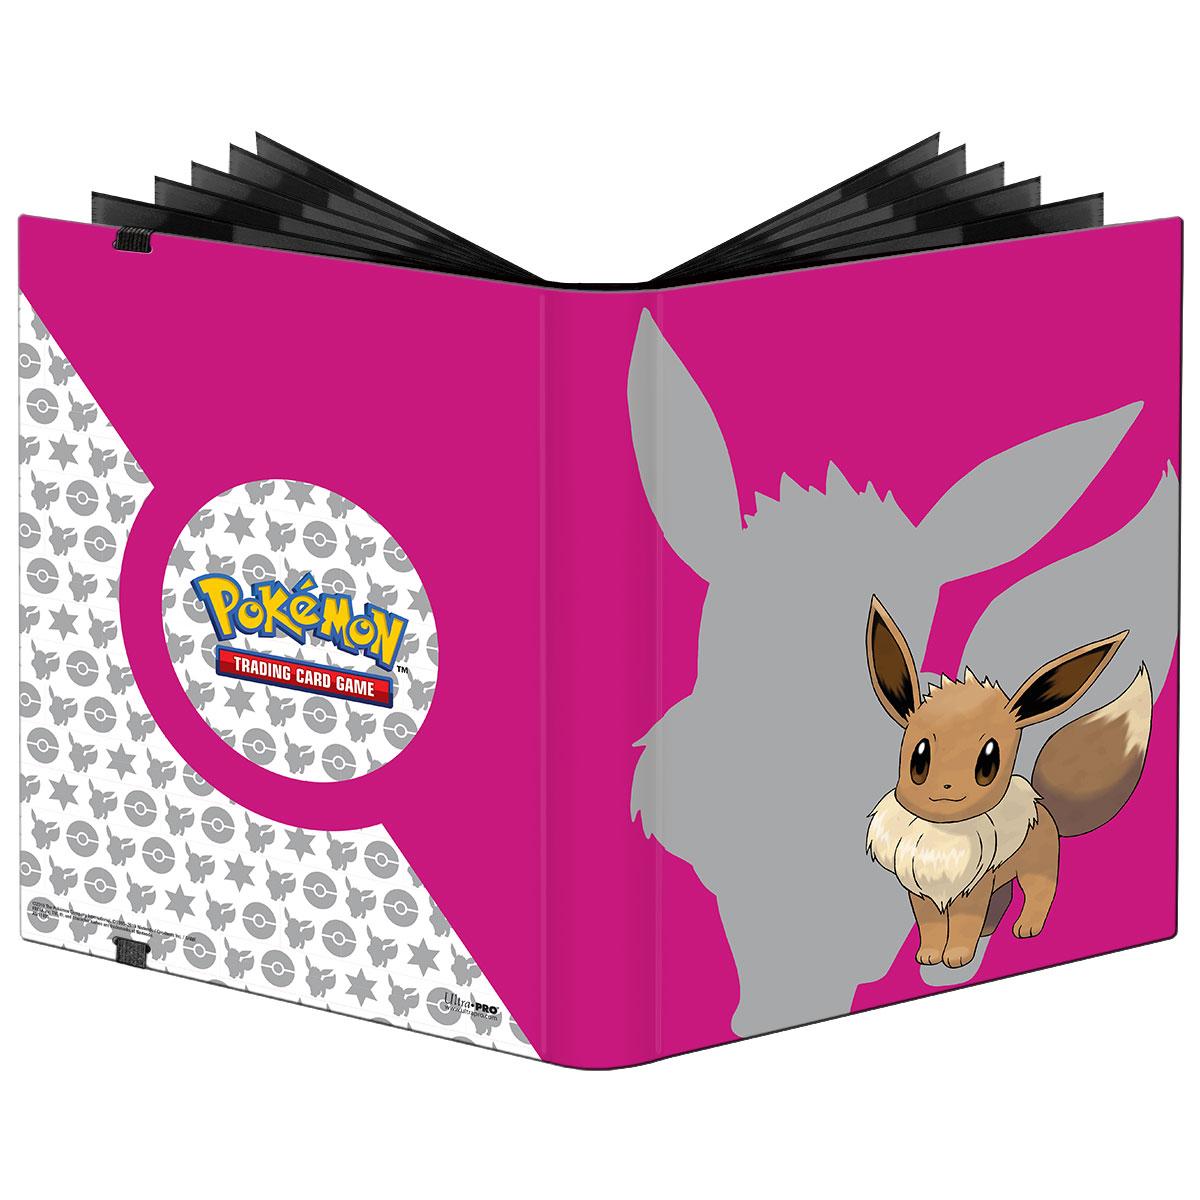 Pokemon Tcg: Eevee 2019 9-pocket Pro-binder Game Box